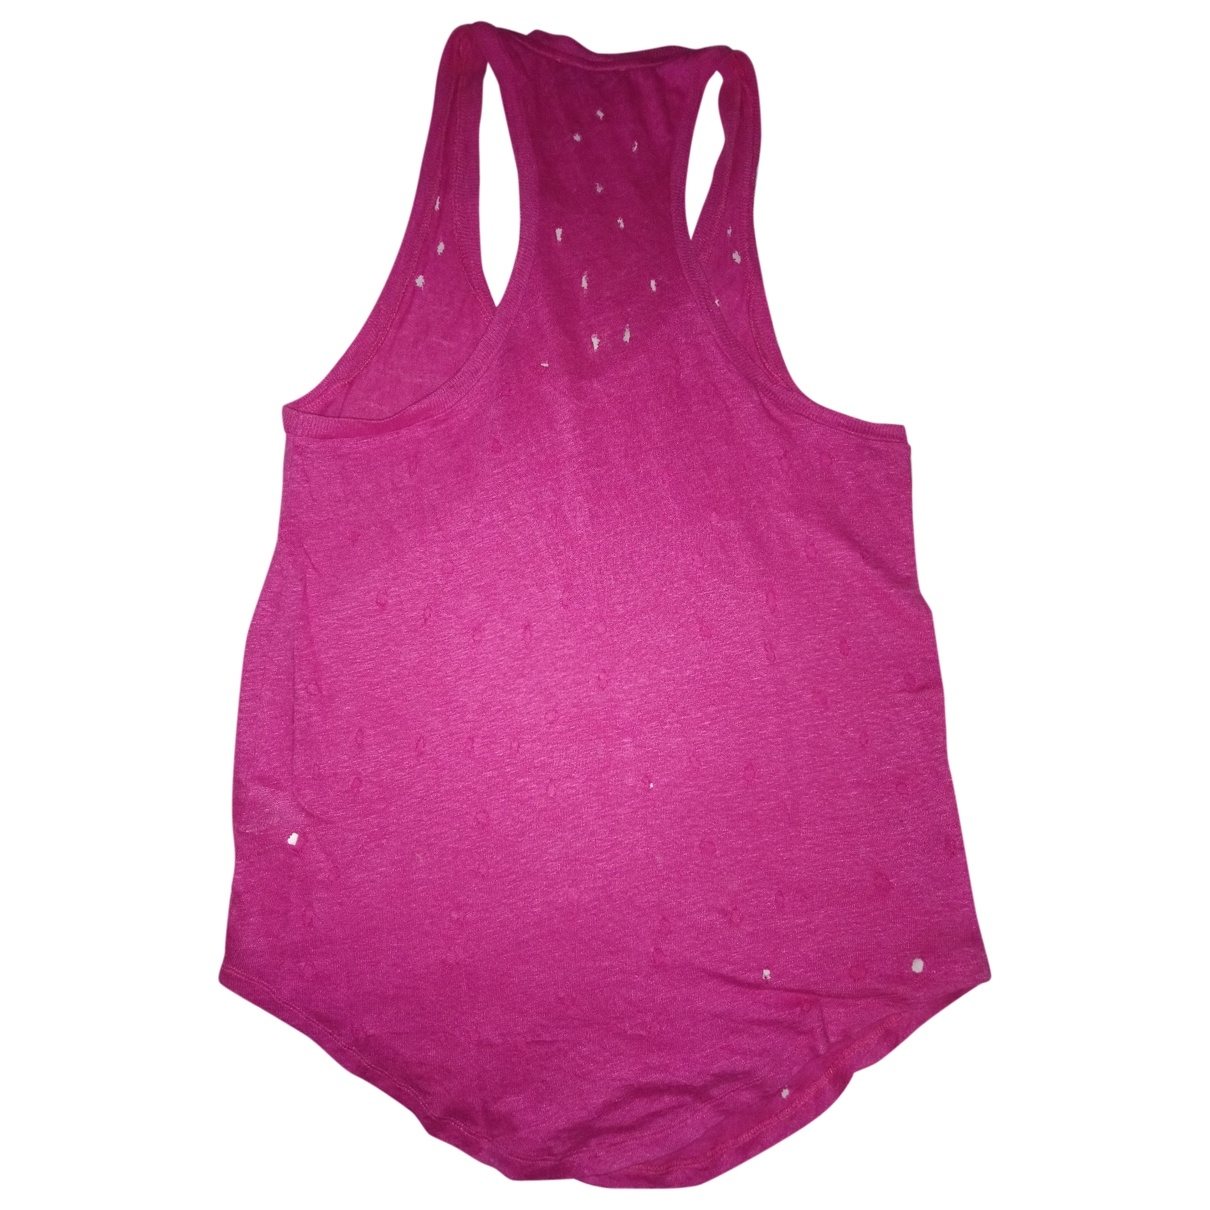 Iro - Top   pour femme en lin - rose